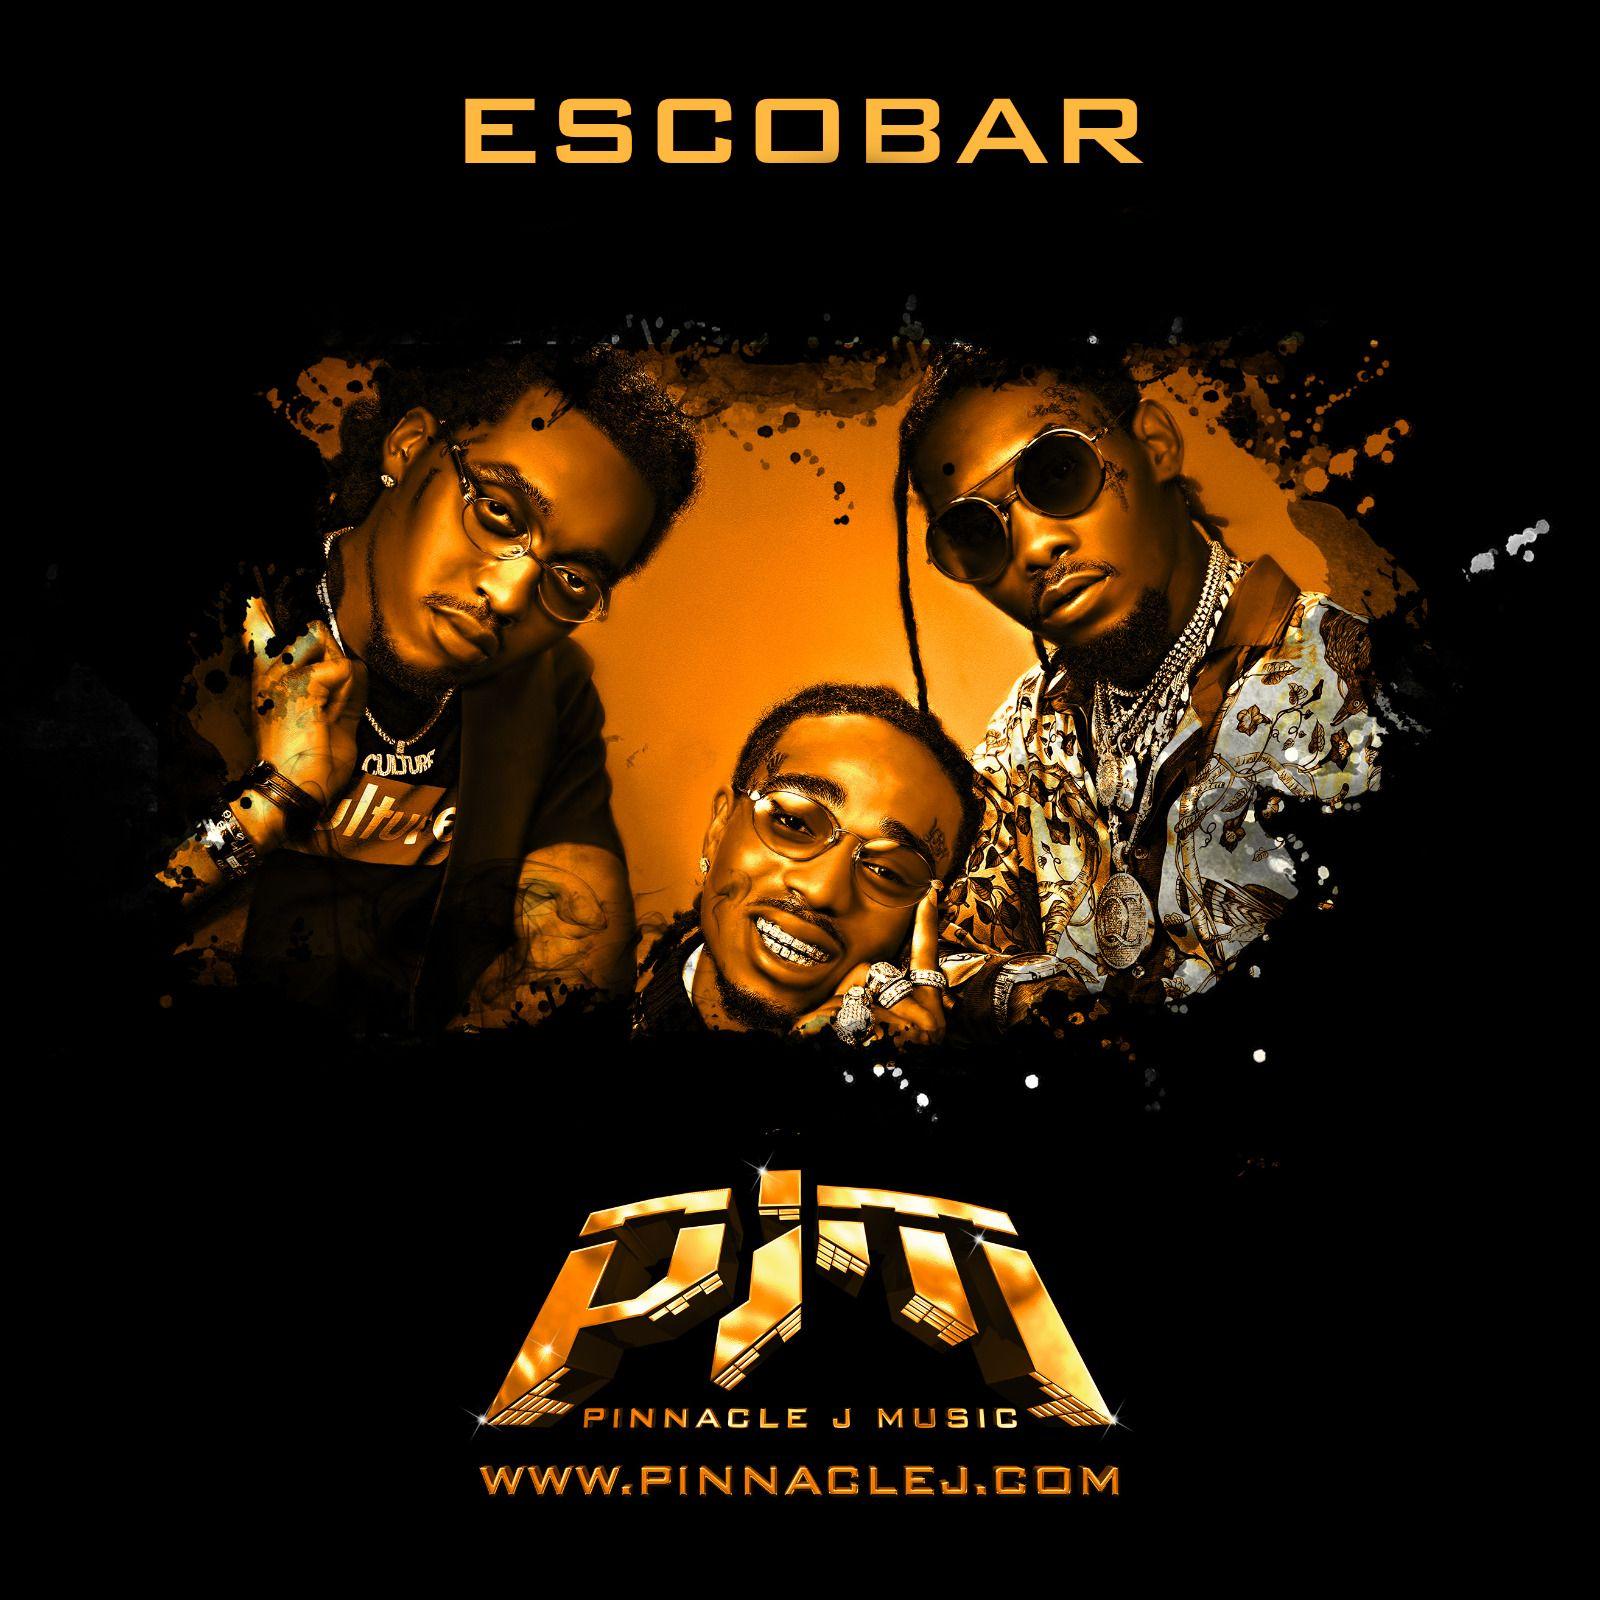 Escobar - Free Meek Mill x Offset Latin Trap Type Beat by